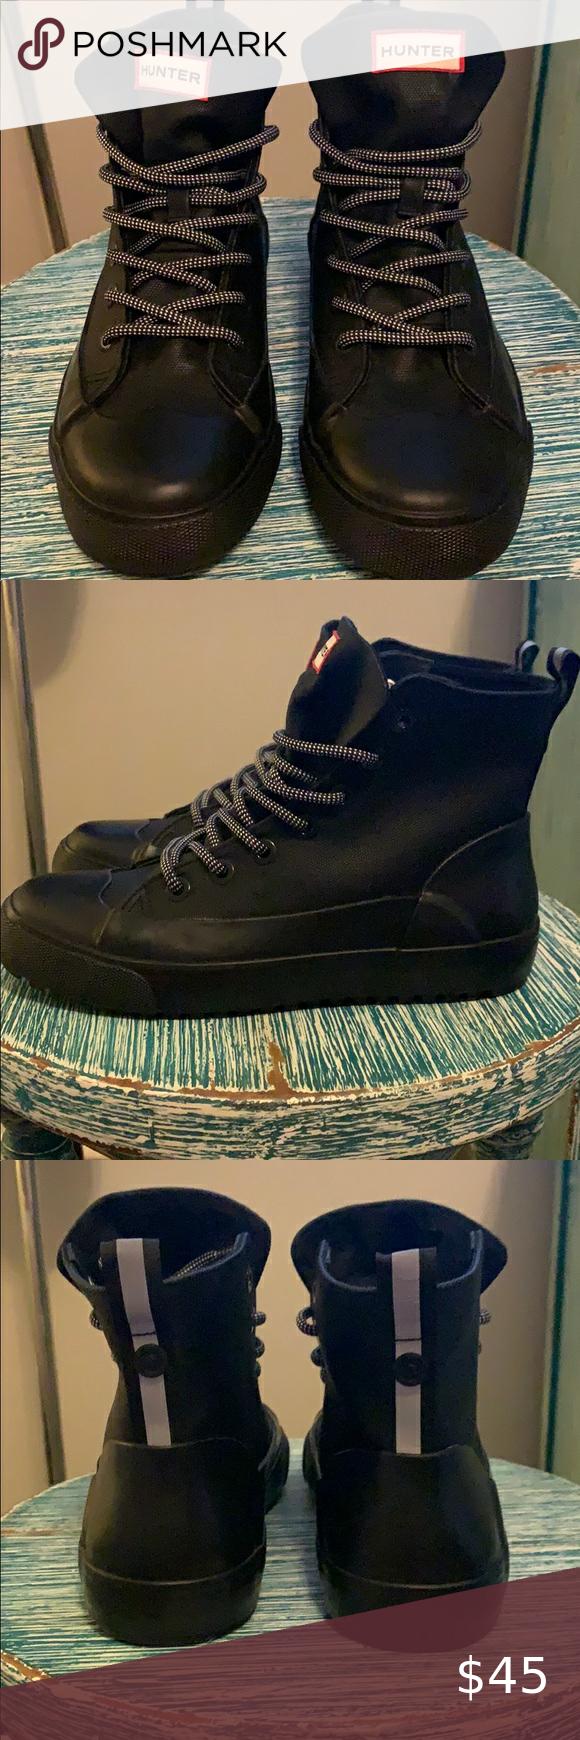 SOLD**HUNTER Shoes by Target Waterproof